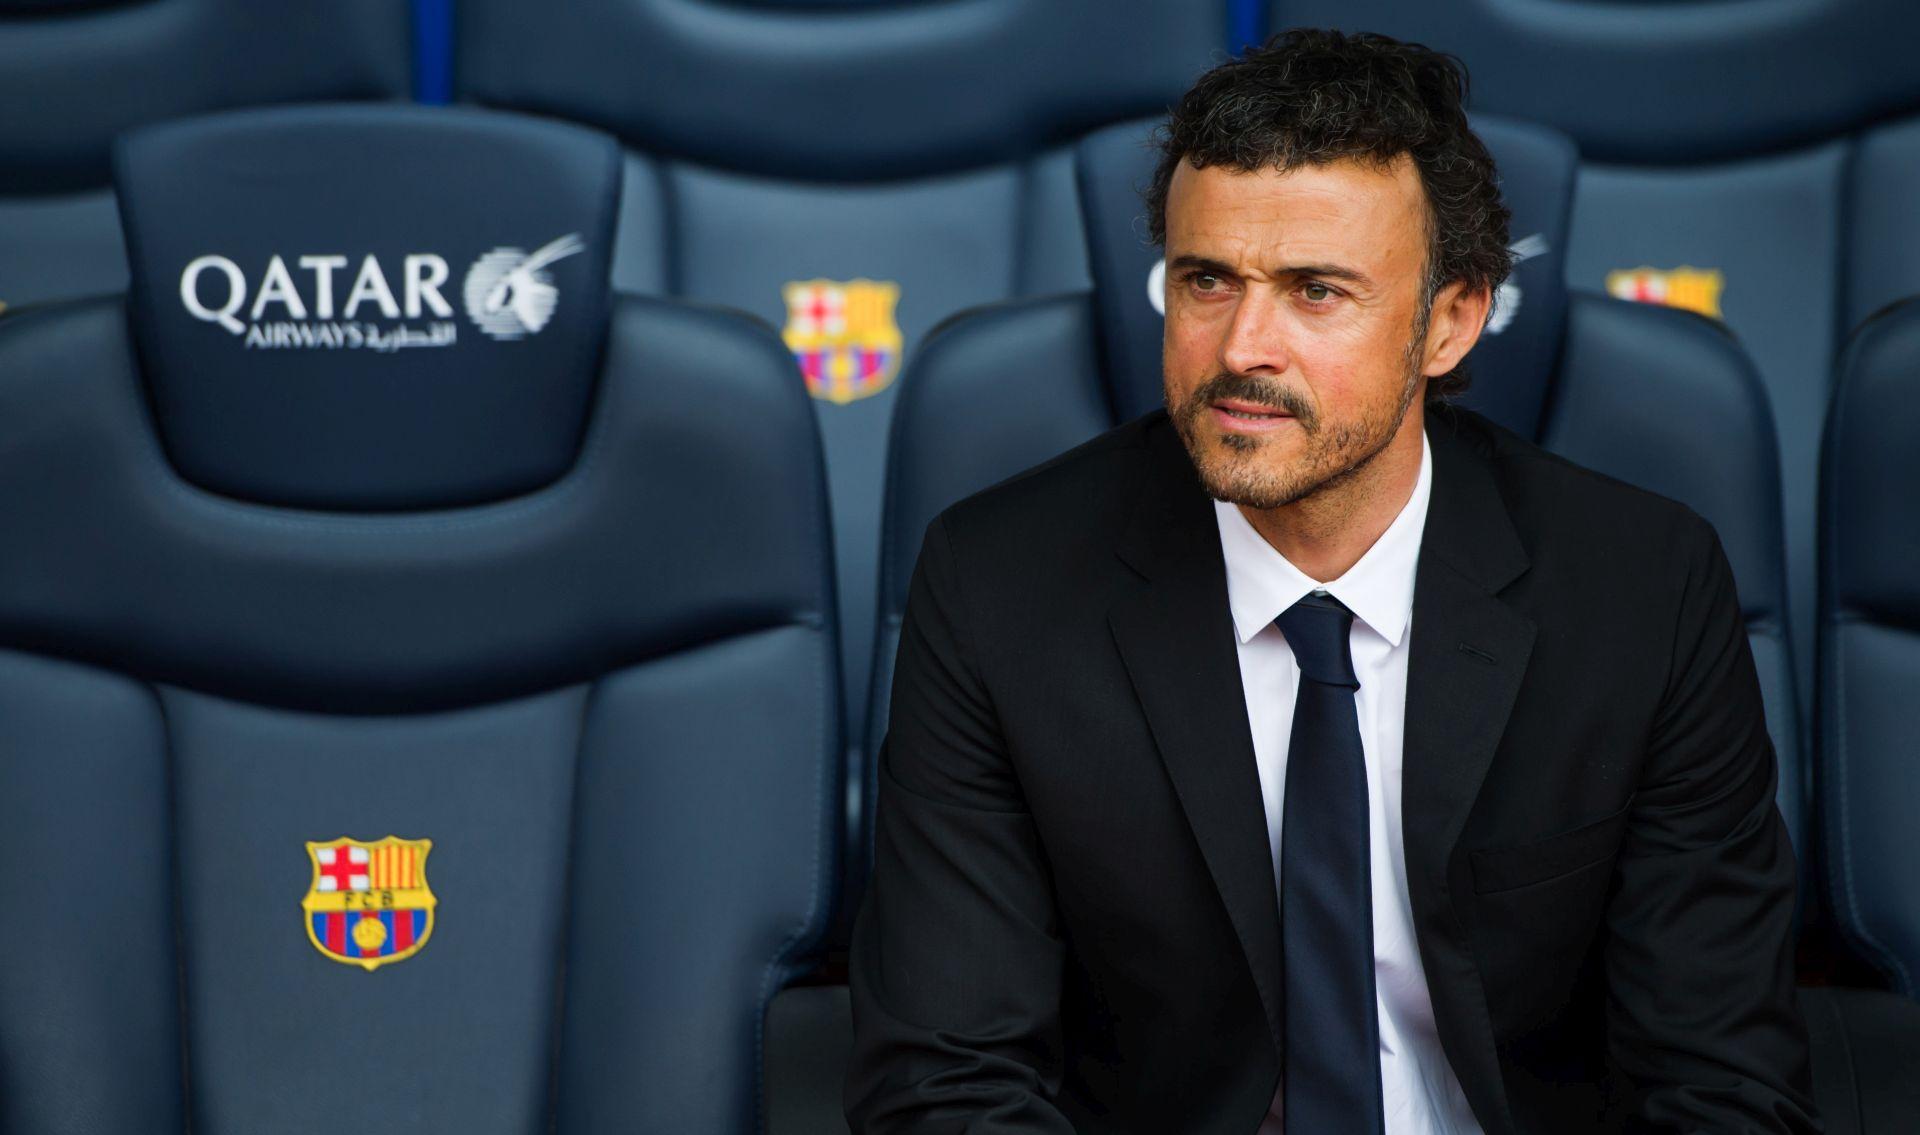 Luis Enrique napušta klupu Barcelone na kraju sezone